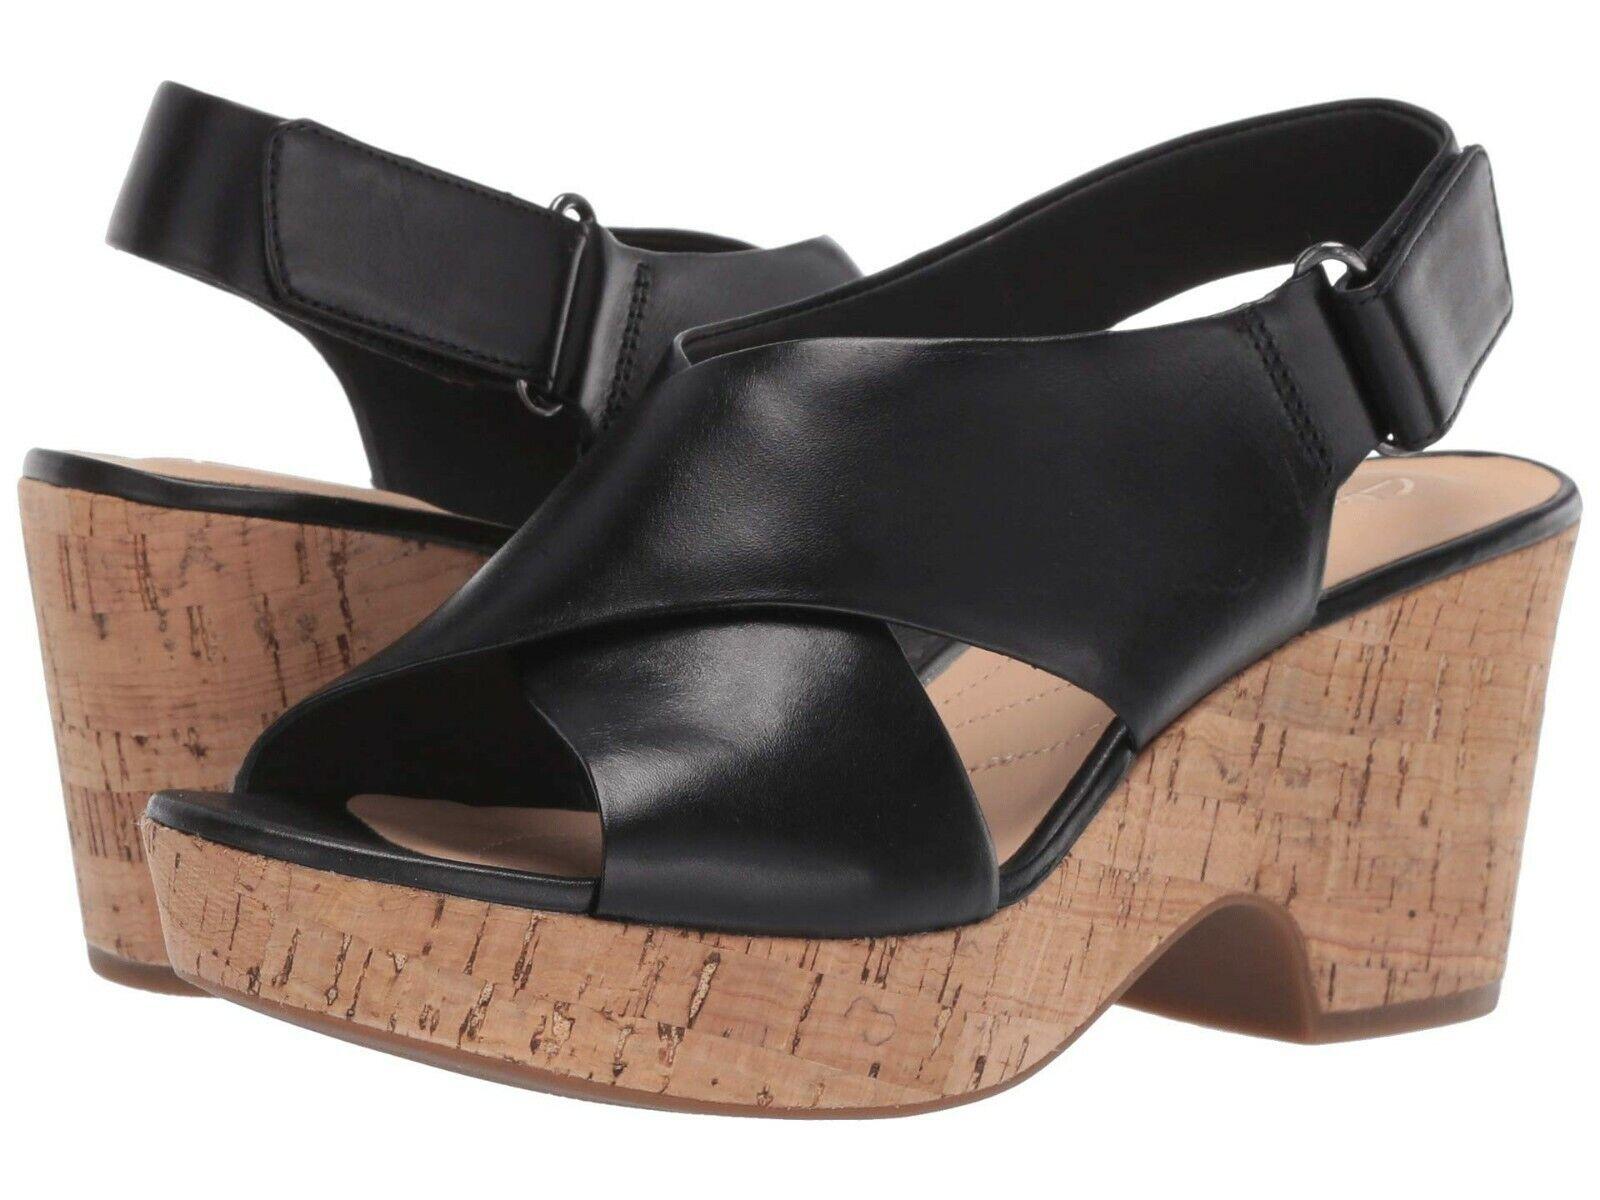 Chaussures Plateforme Clarks Sandale Noir Talons Maritsa Cuir Lara mn0Nyv8wO